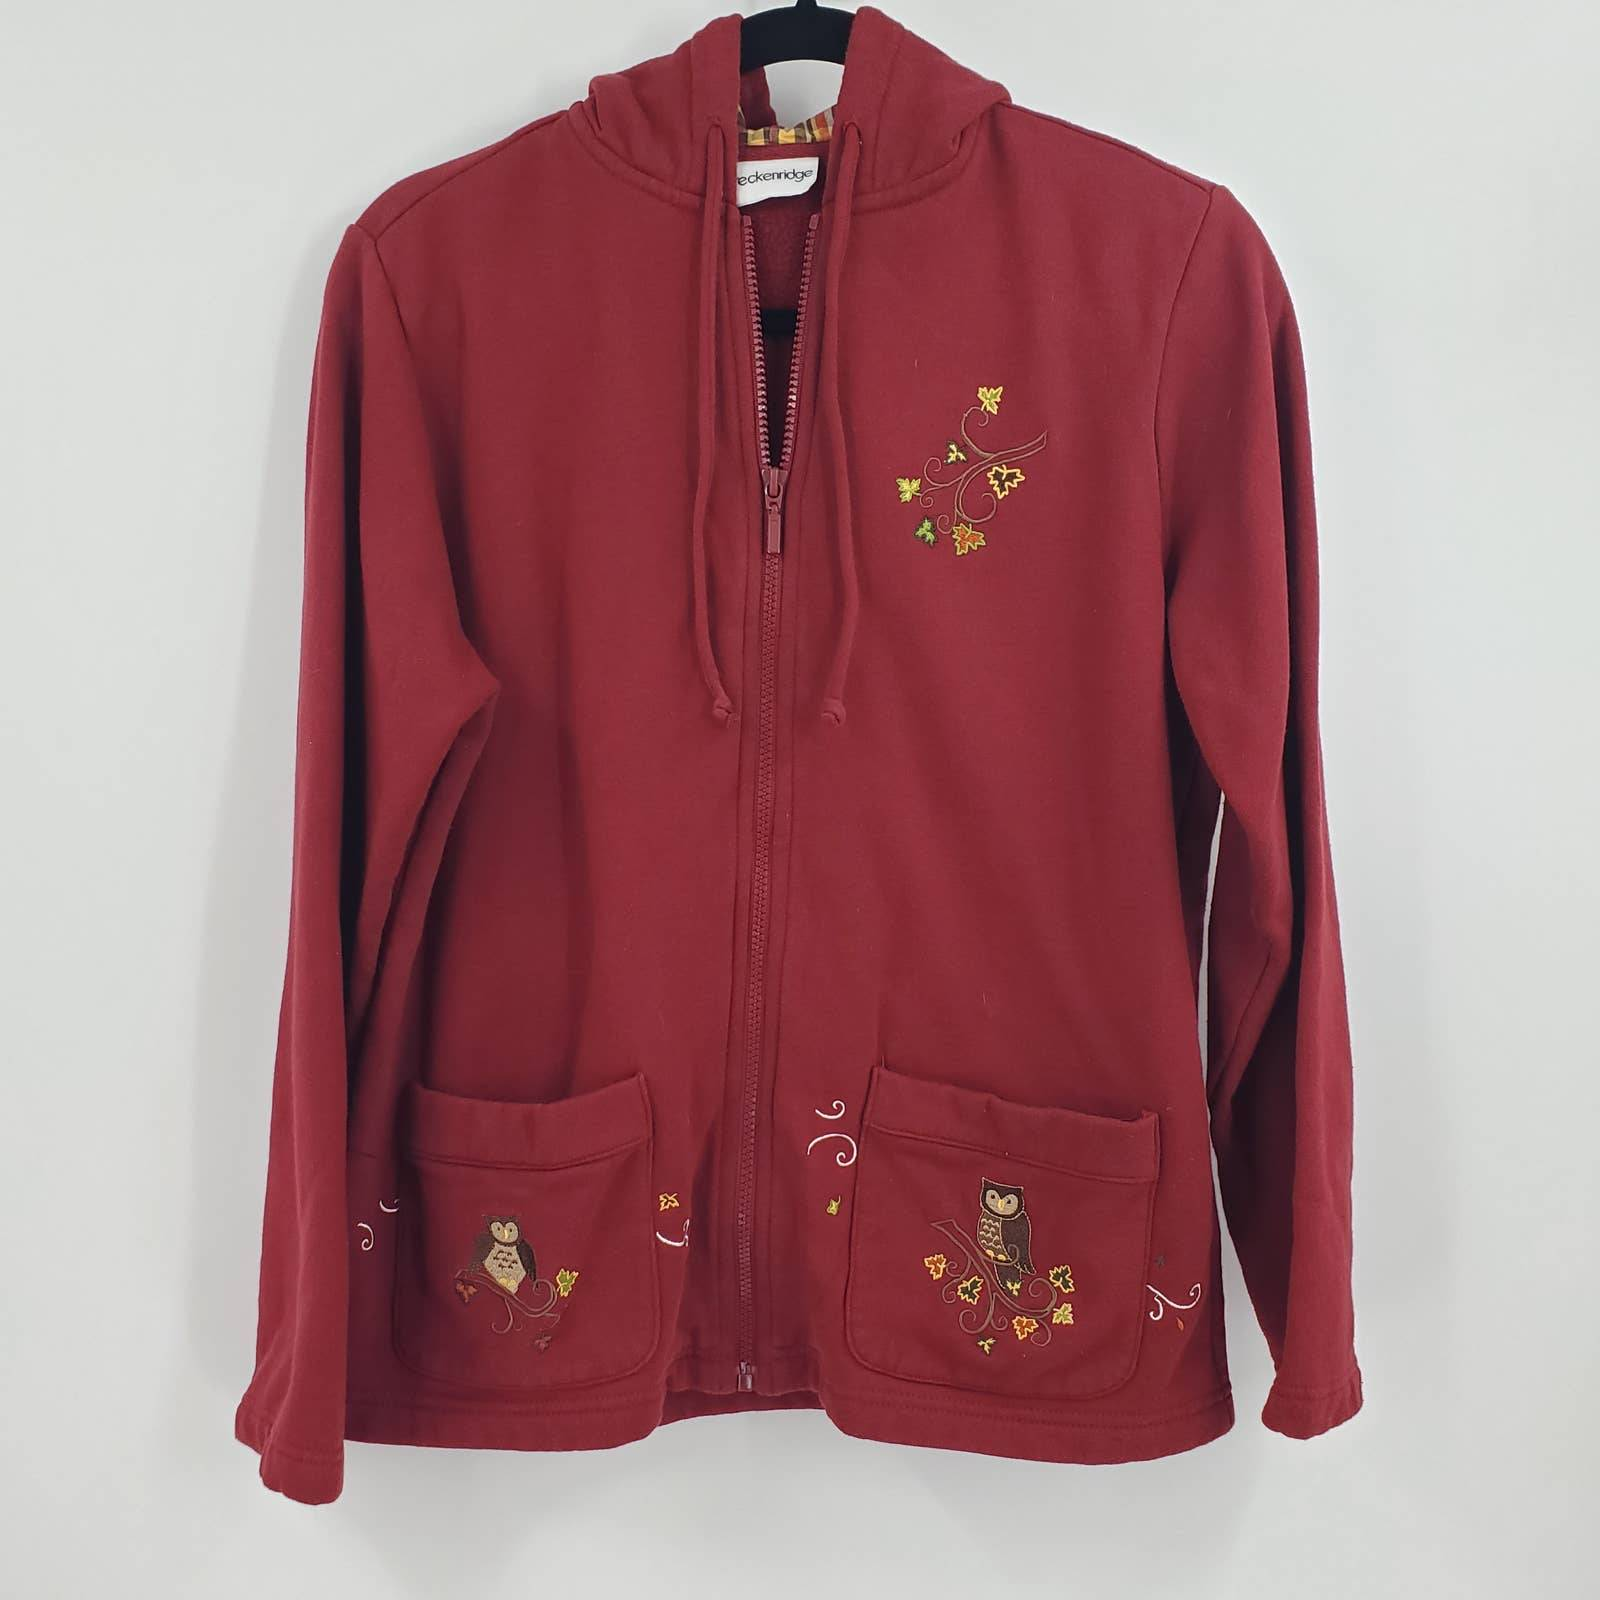 Vintage Jacket Embroidered Hooded Zip Up